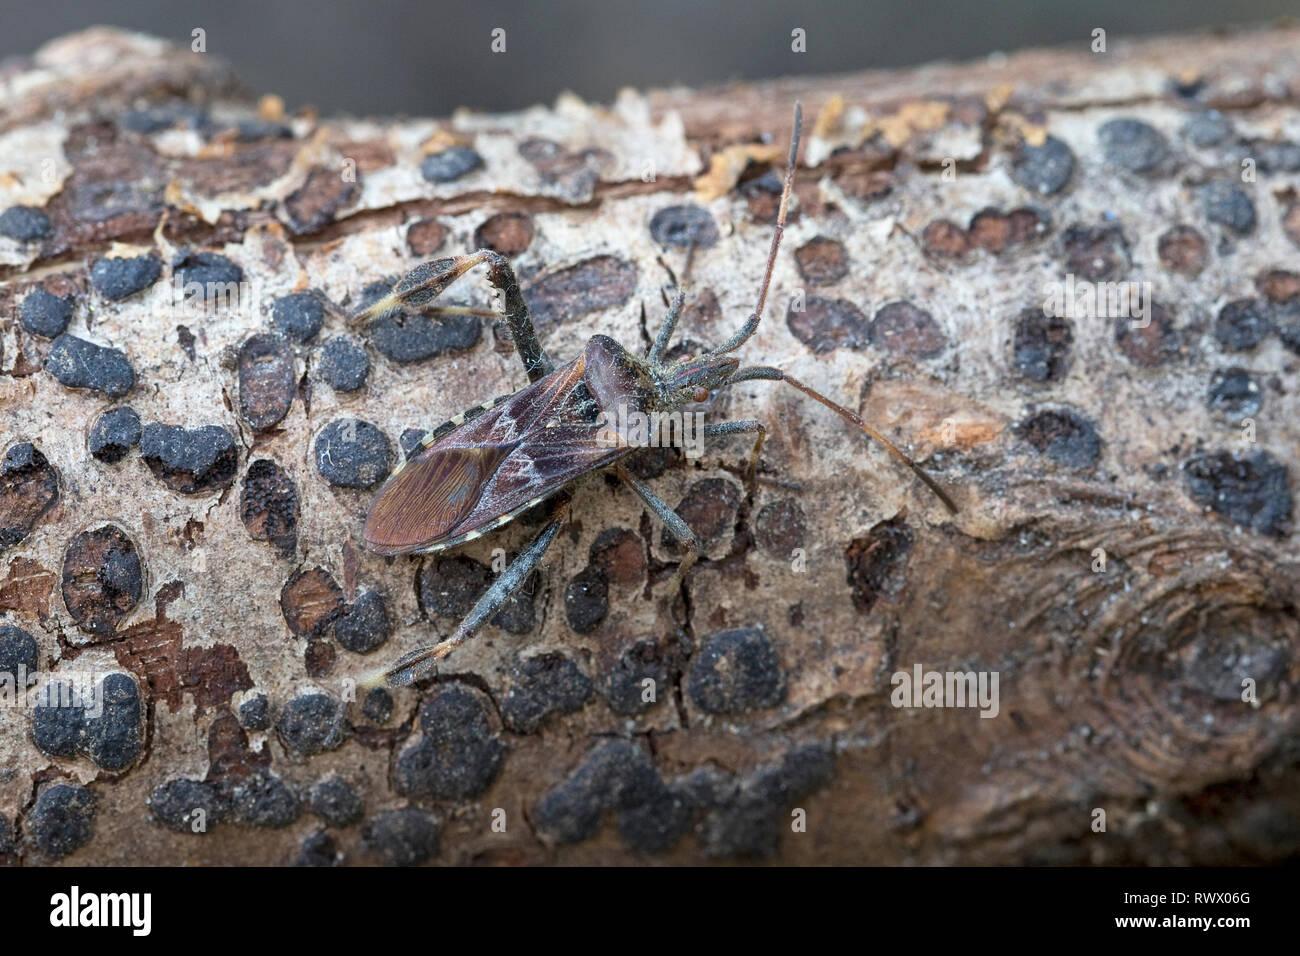 Western Conifer Seed Bug (Leptoglossus occidentalis) - Stock Image